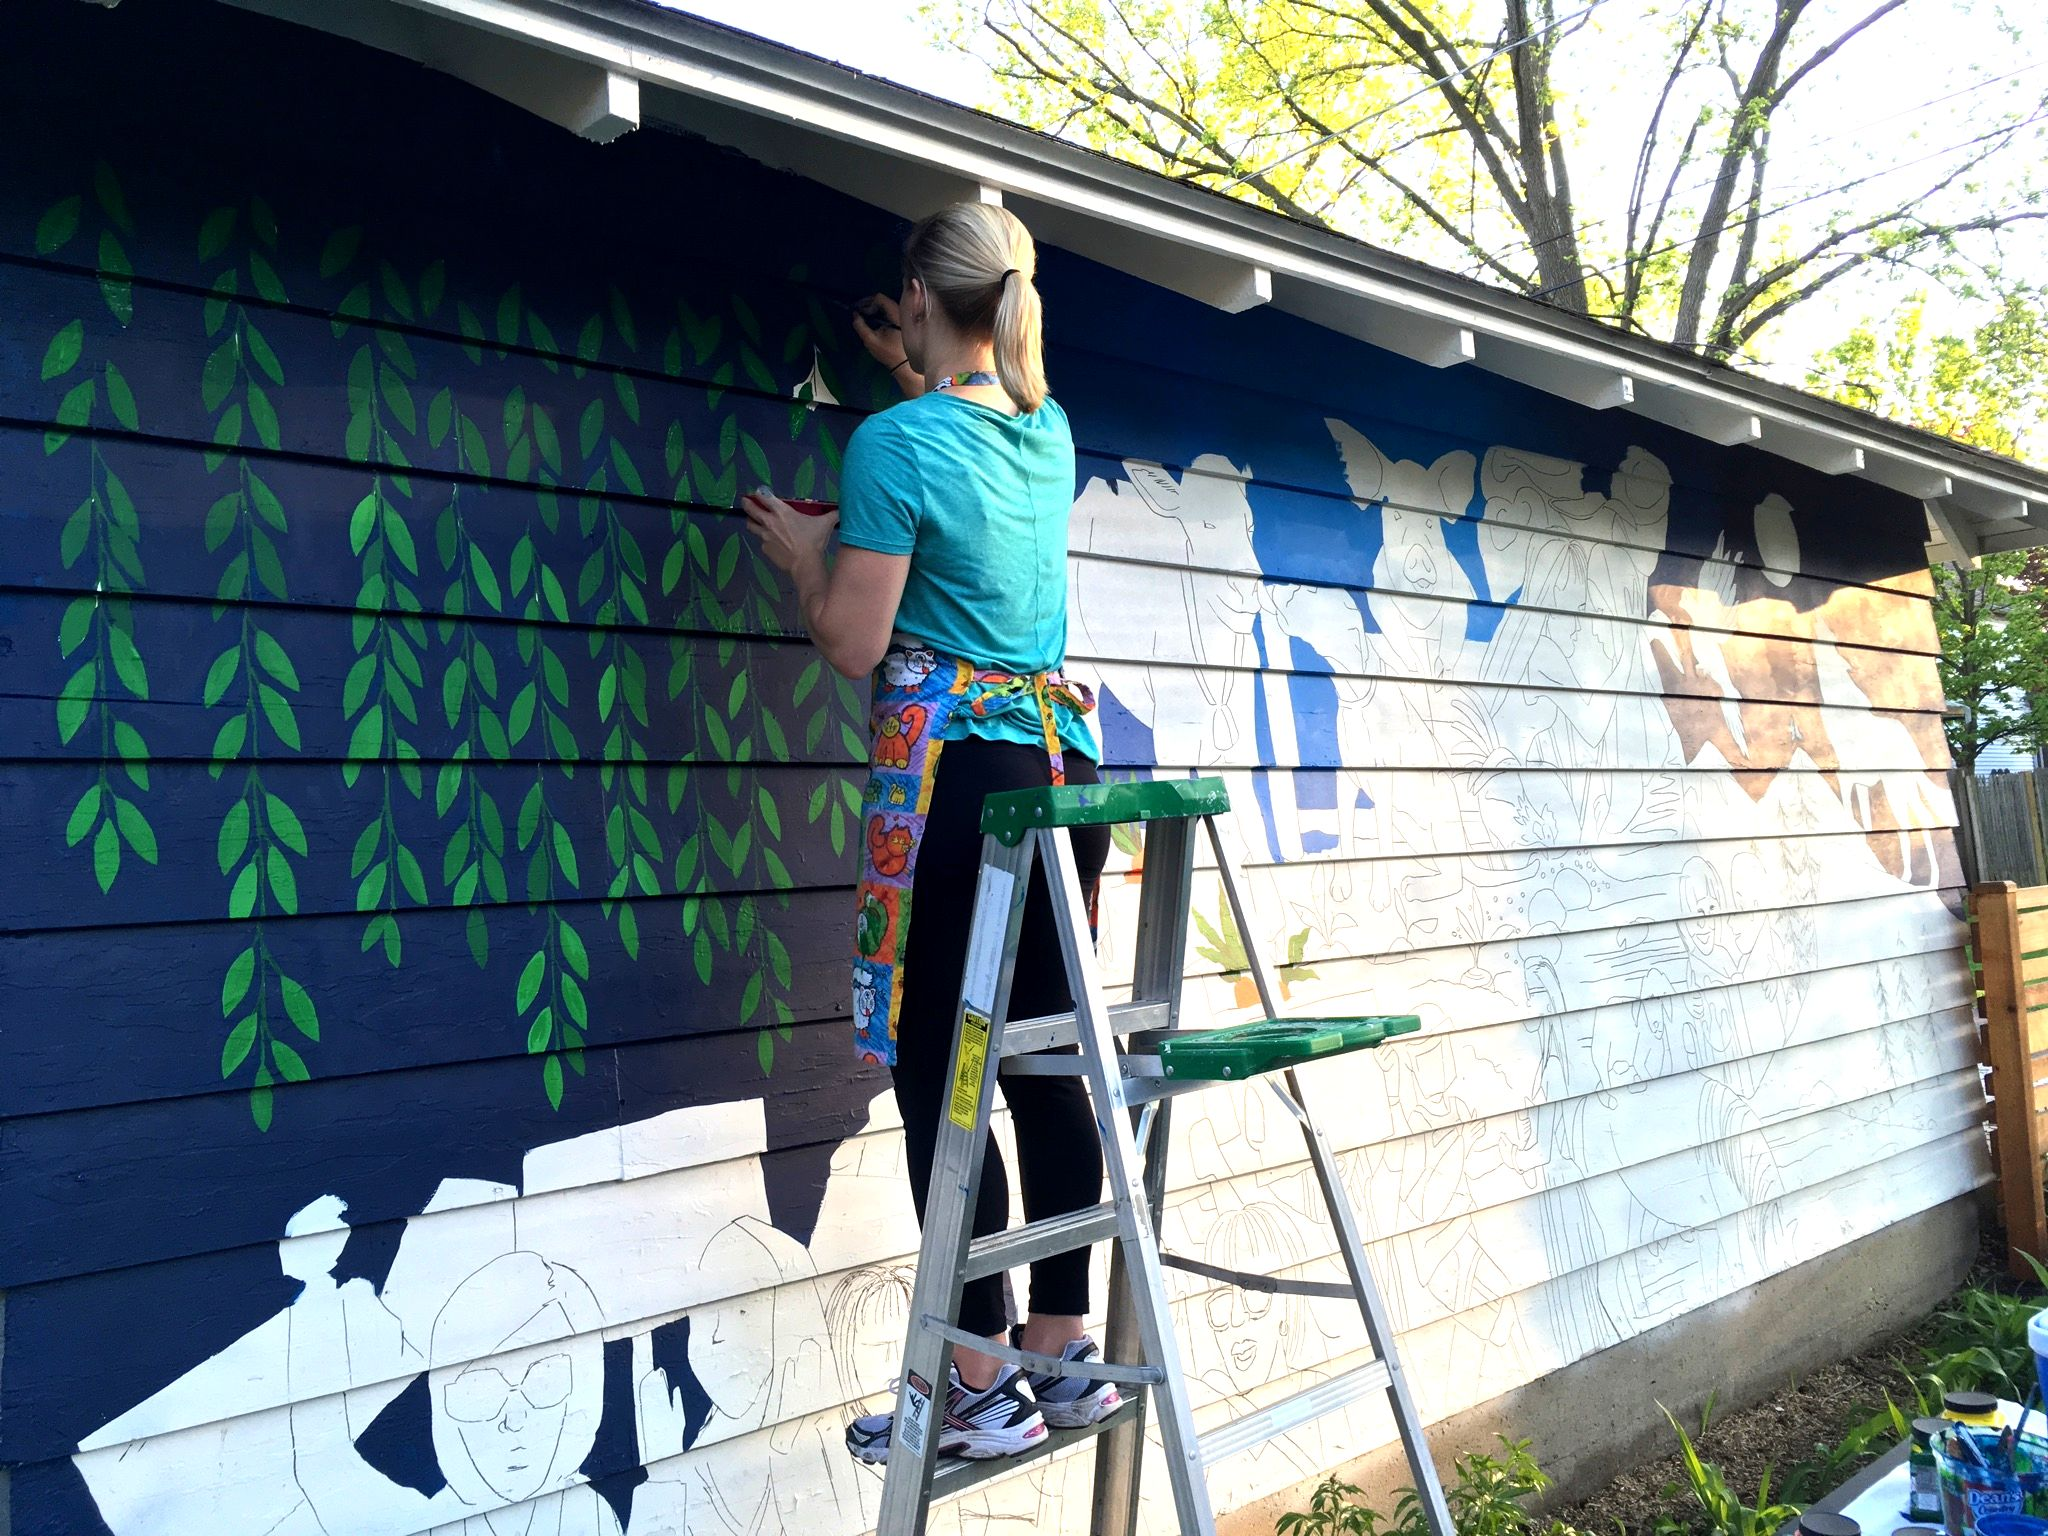 local Murals -